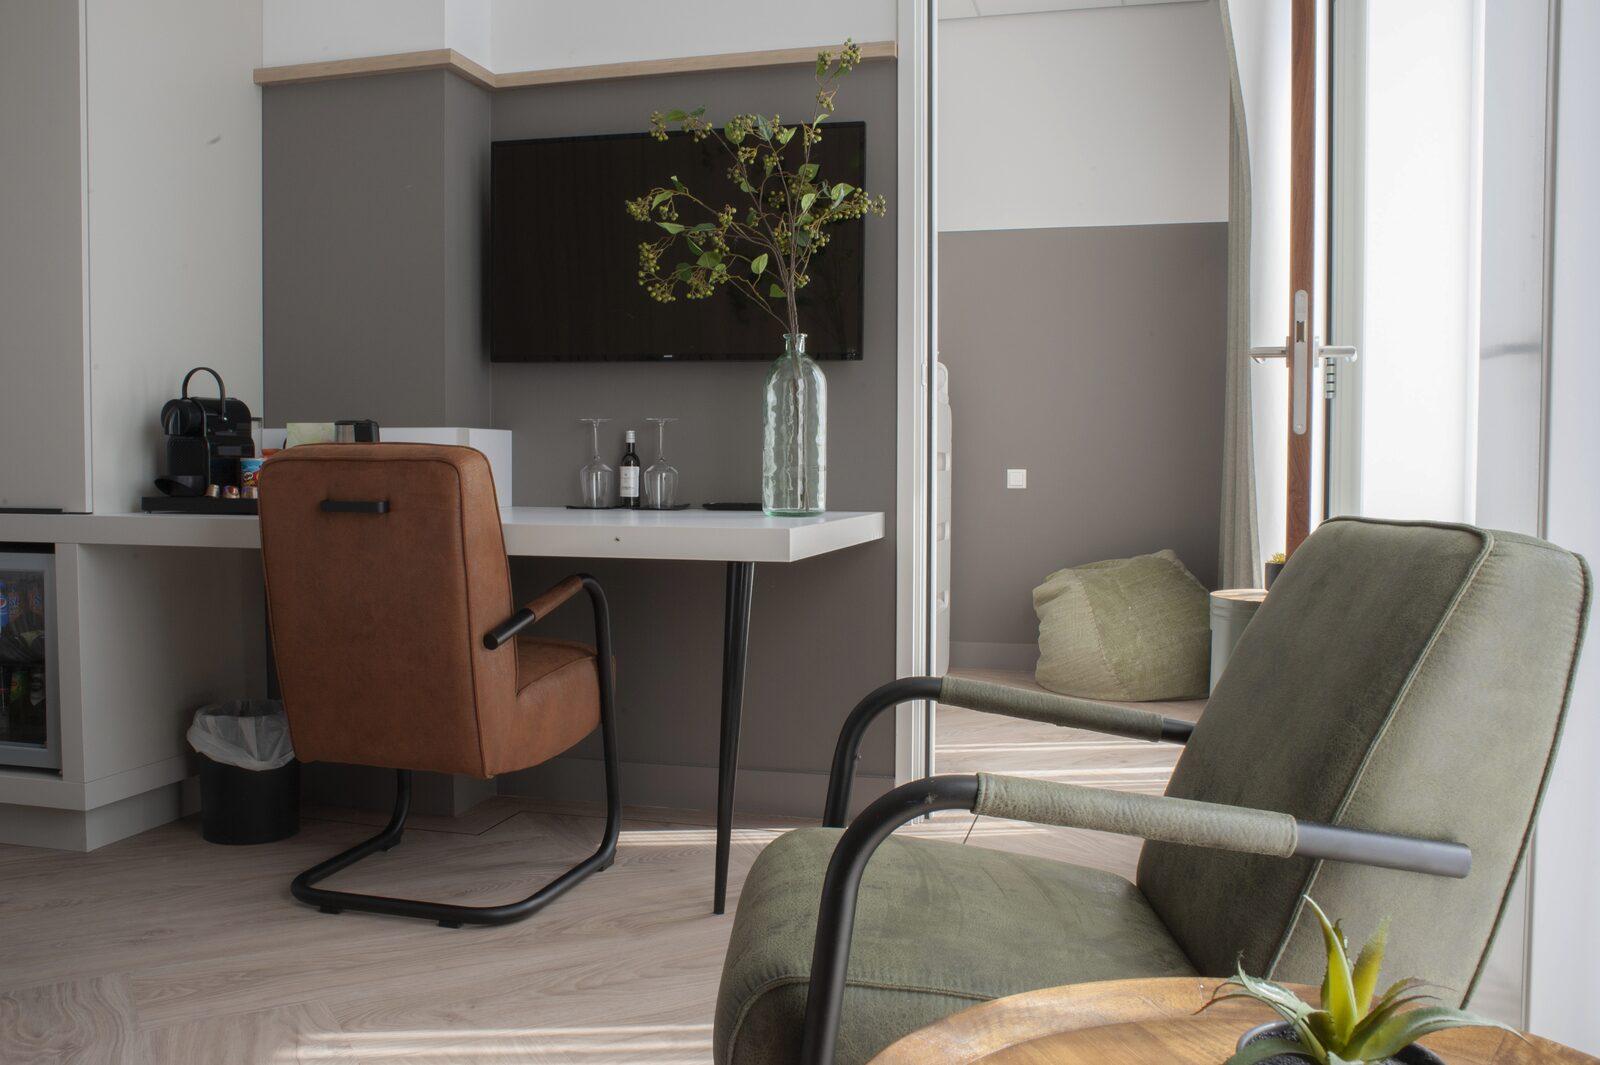 4-persoons Luxe Familiekamer